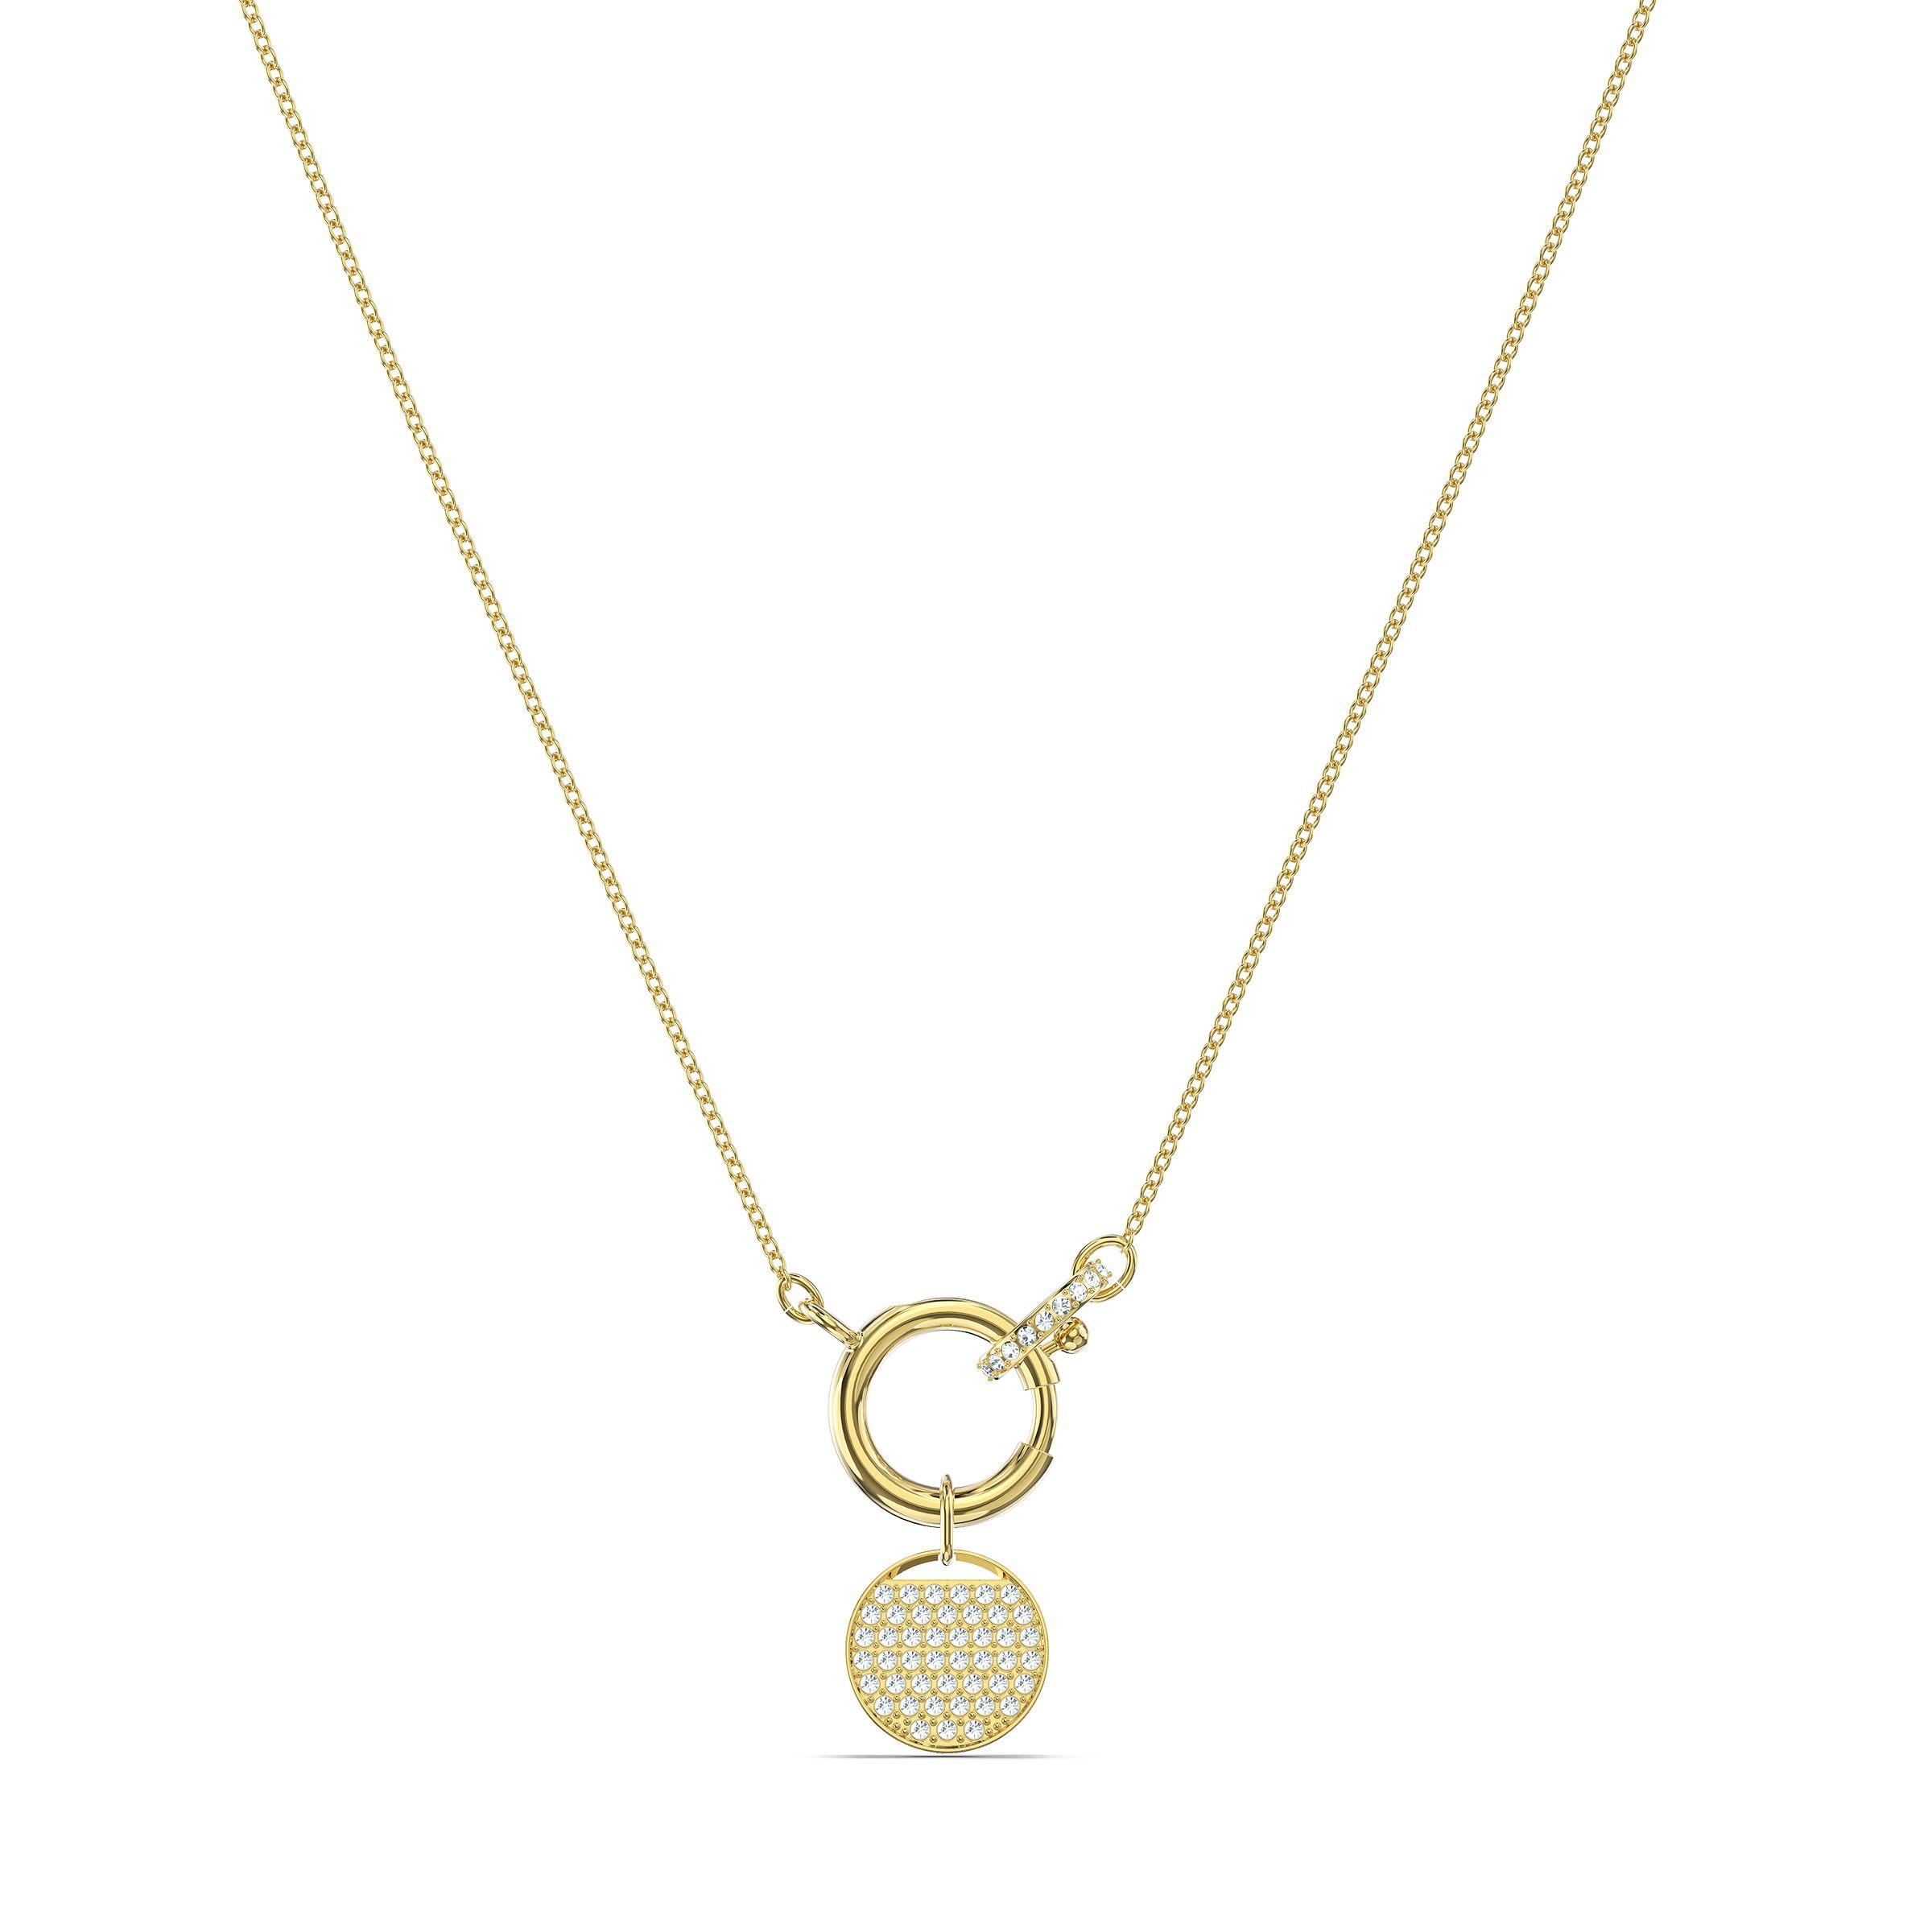 Collier Ginger Charm, blanc, métal doré, Swarovski